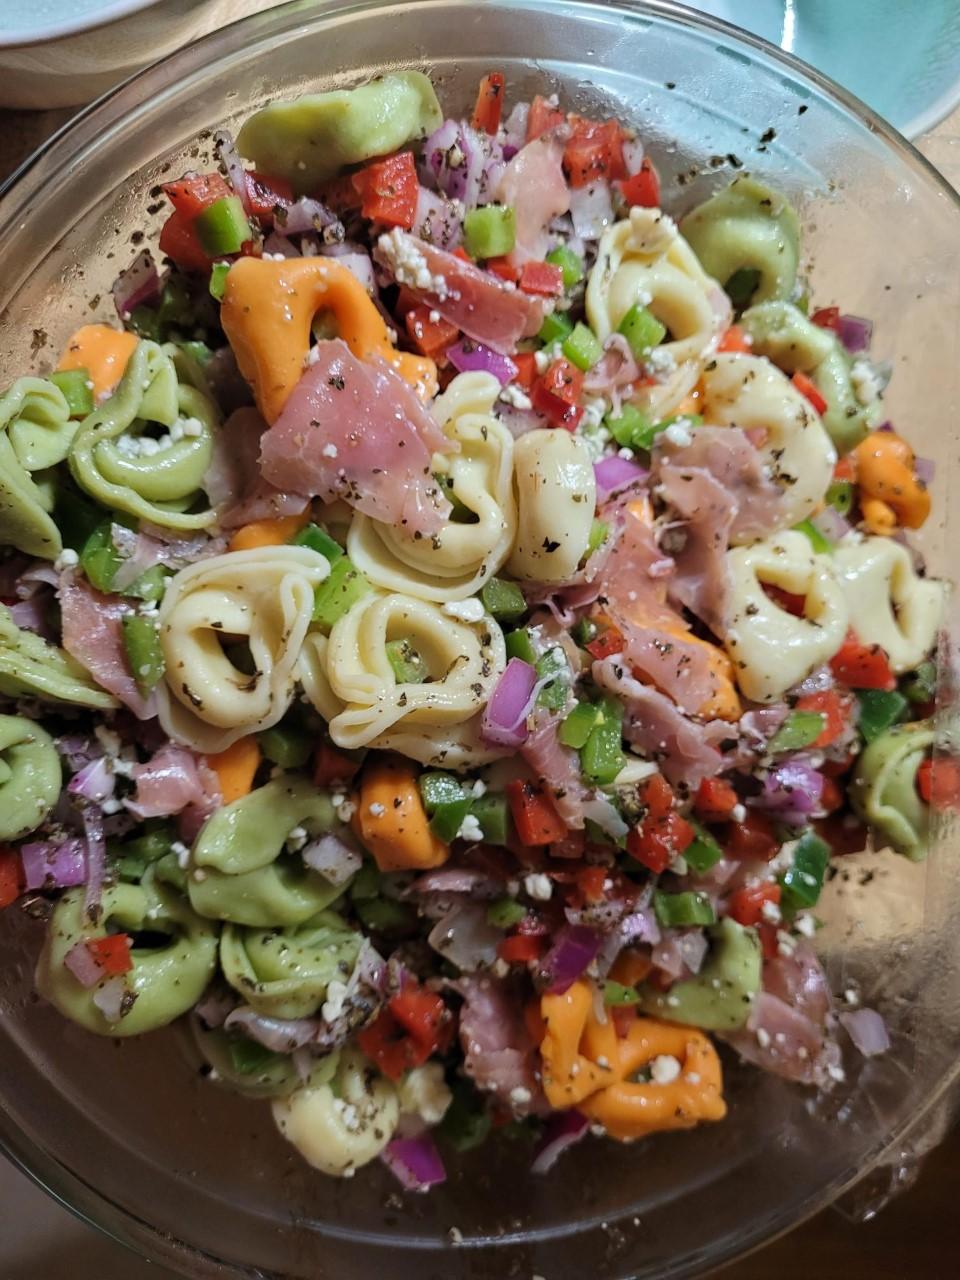 Gorgonzola and Prosciutto Tortellini Salad ErinColleen